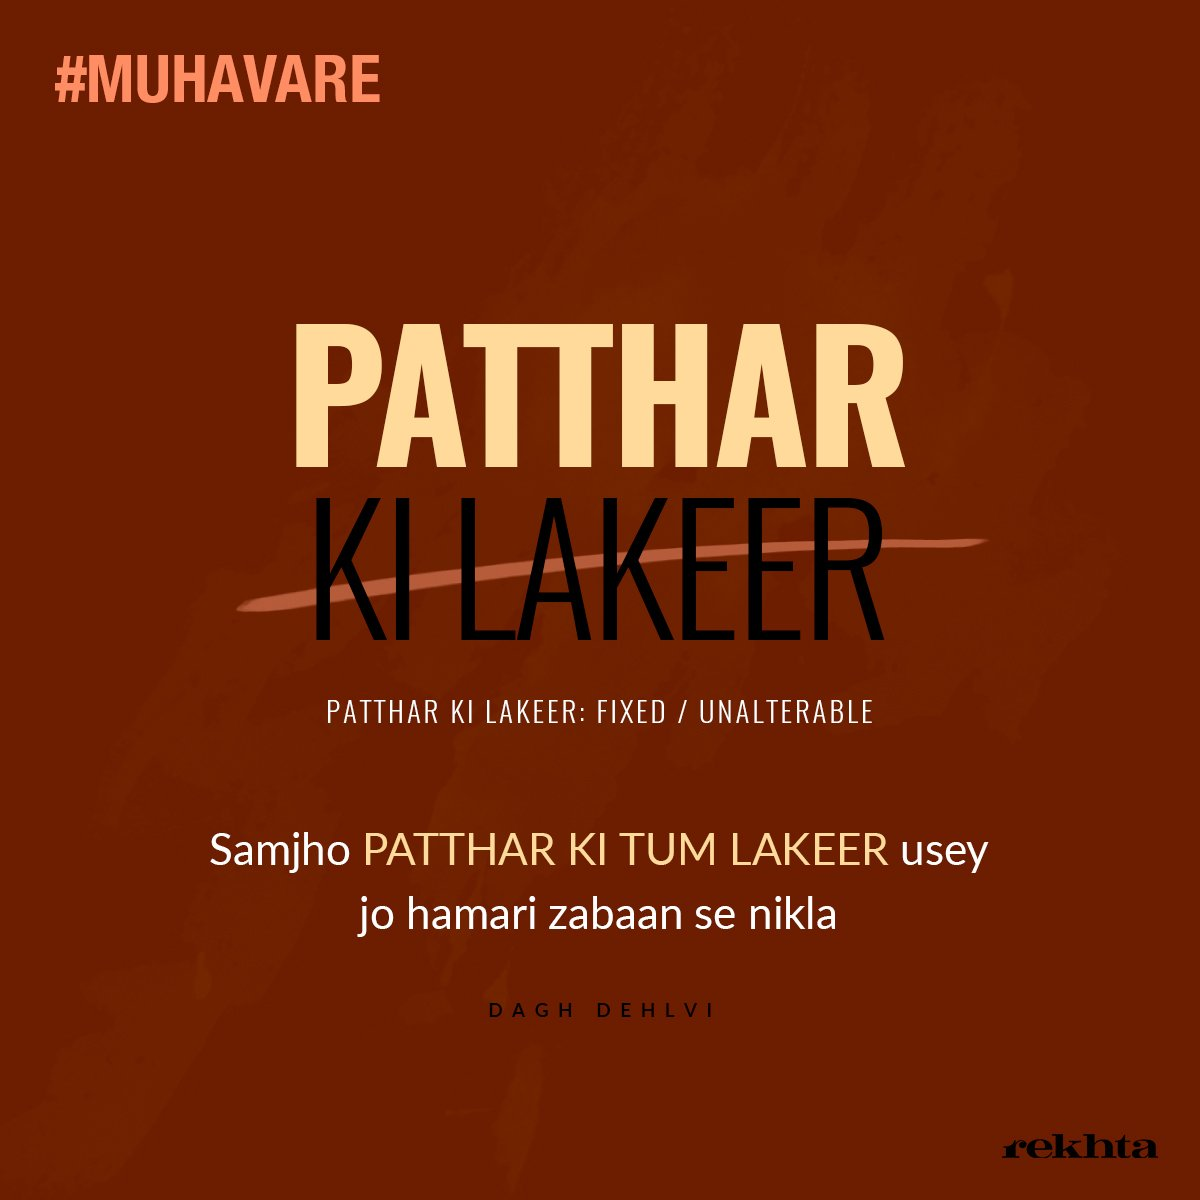 muhavare hashtag on Twitter